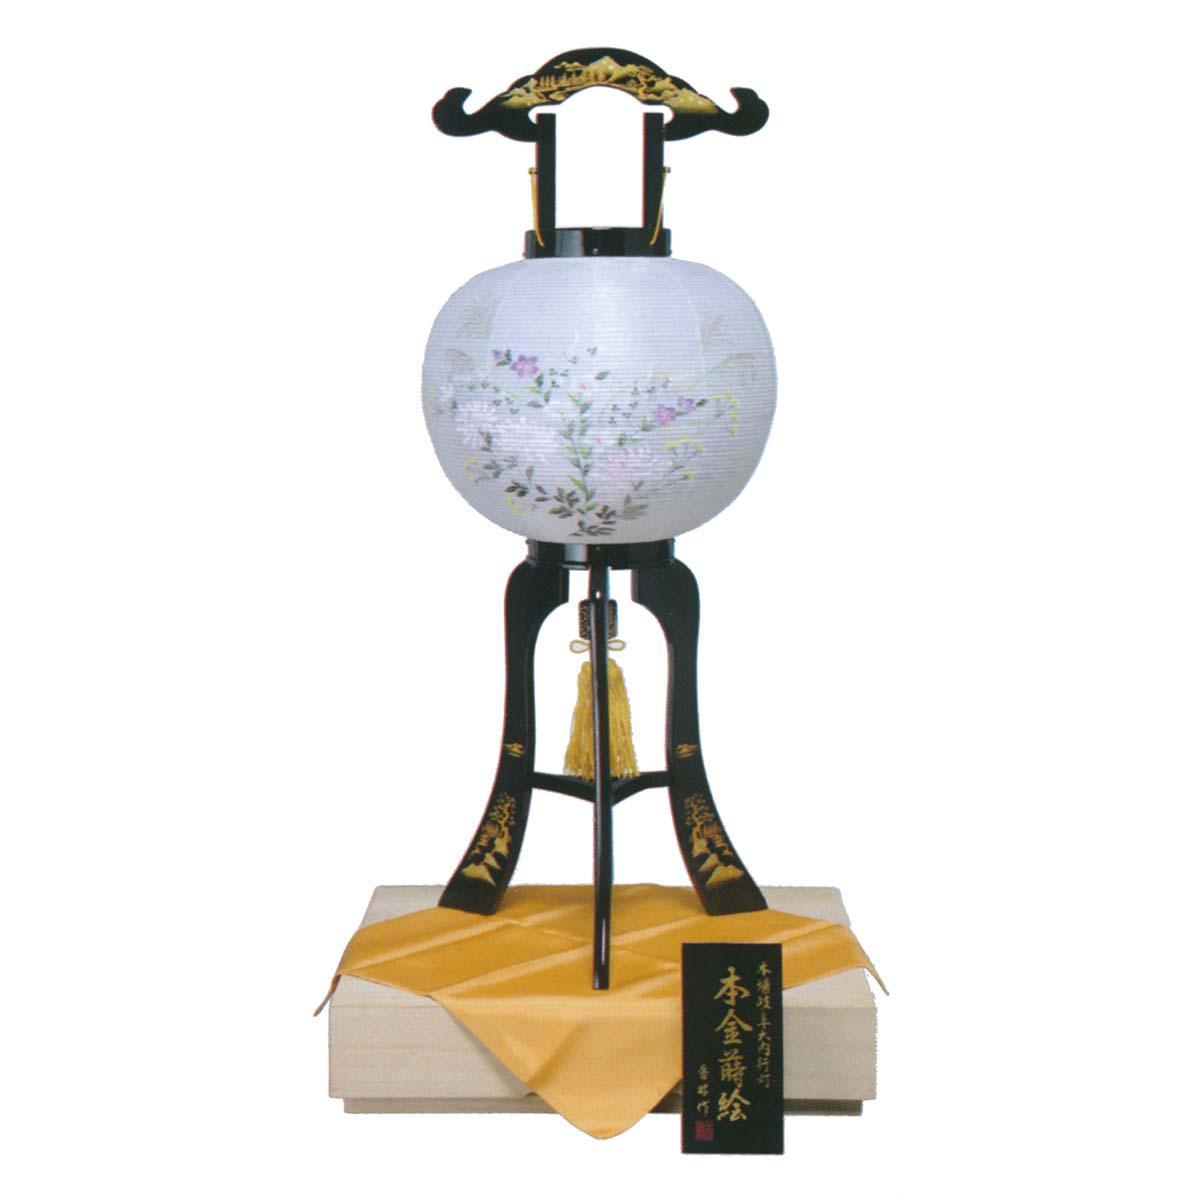 盆提灯 銘木高級品 『 加賀本金蒔絵 行灯 絹二重 桐箱入り 11号 』 BCY-552絹 二重 木製 電気コード式 置き型 置き提灯 行灯 行燈